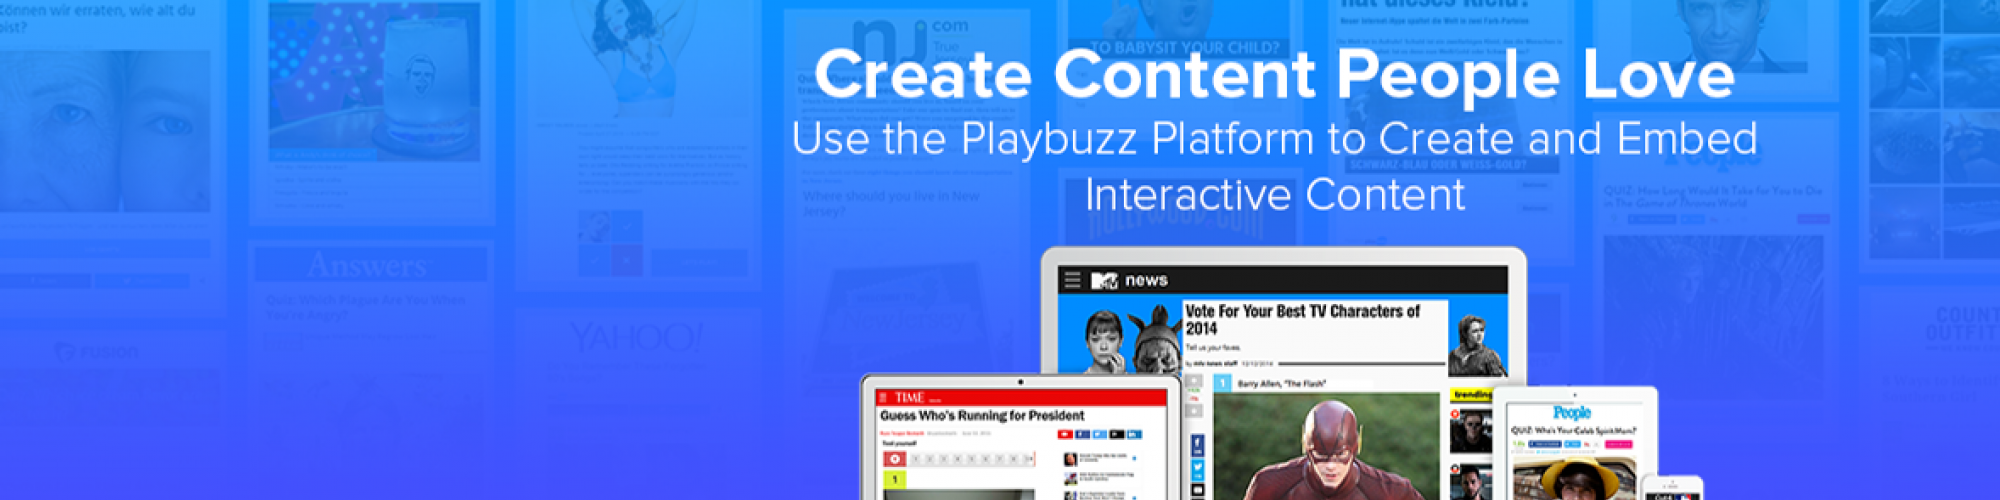 Playbuzz quizzes - YouTube